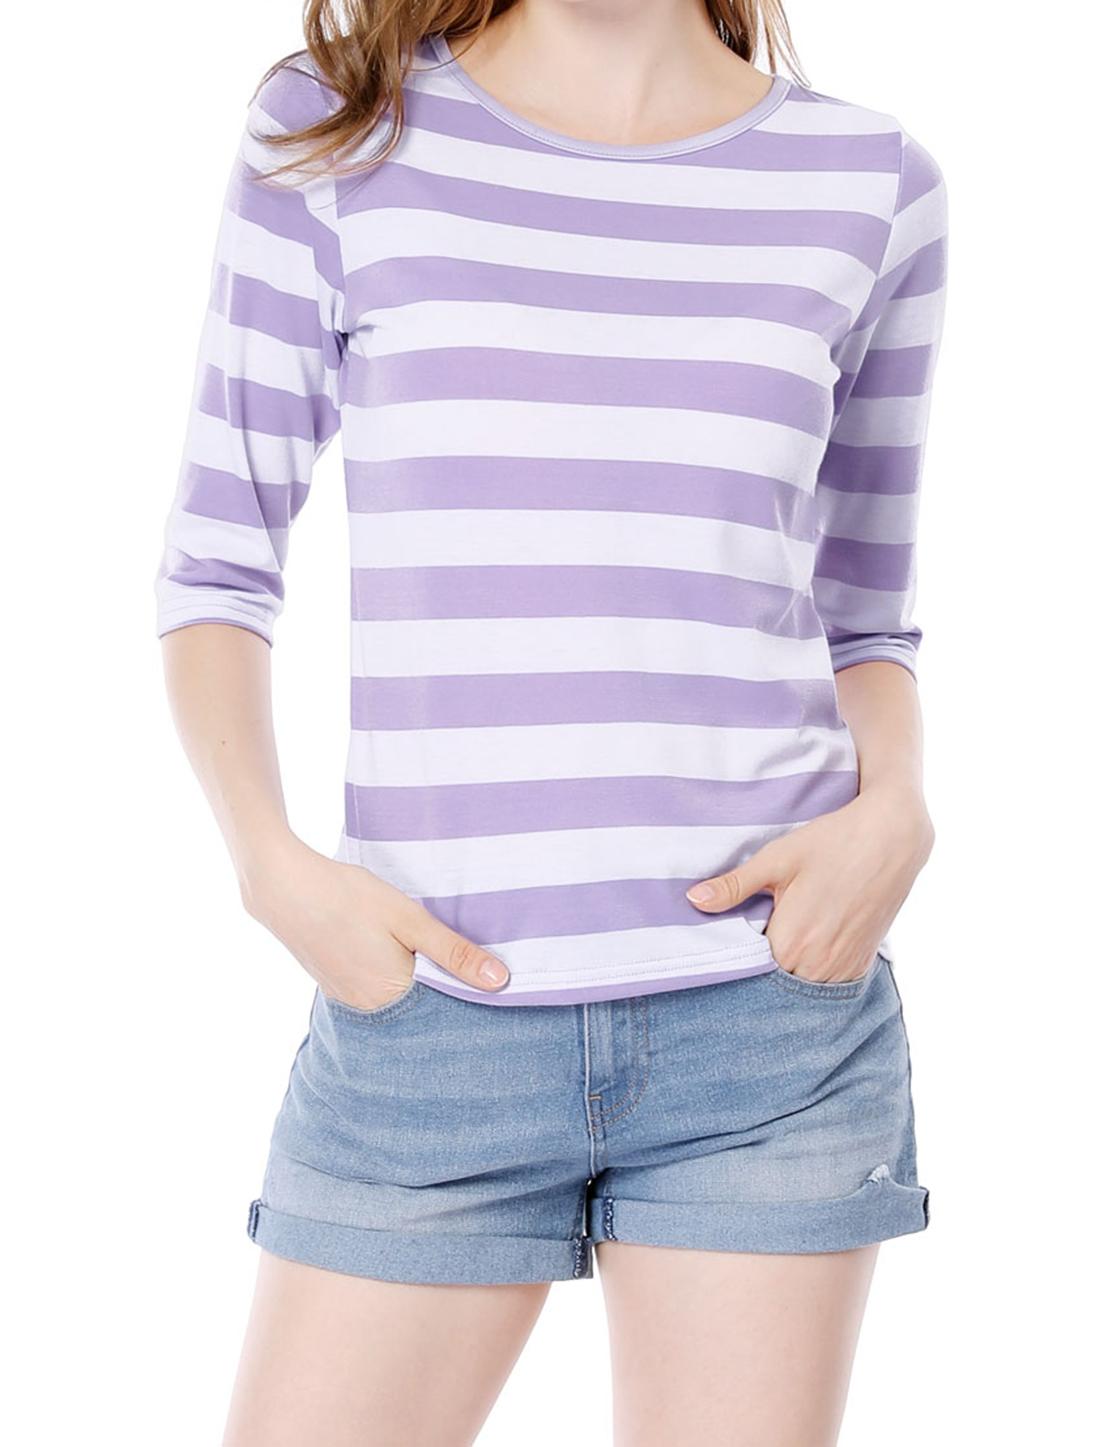 Allegra K Women Elbow Sleeve Contrast Color Printed Tee Light Purple M